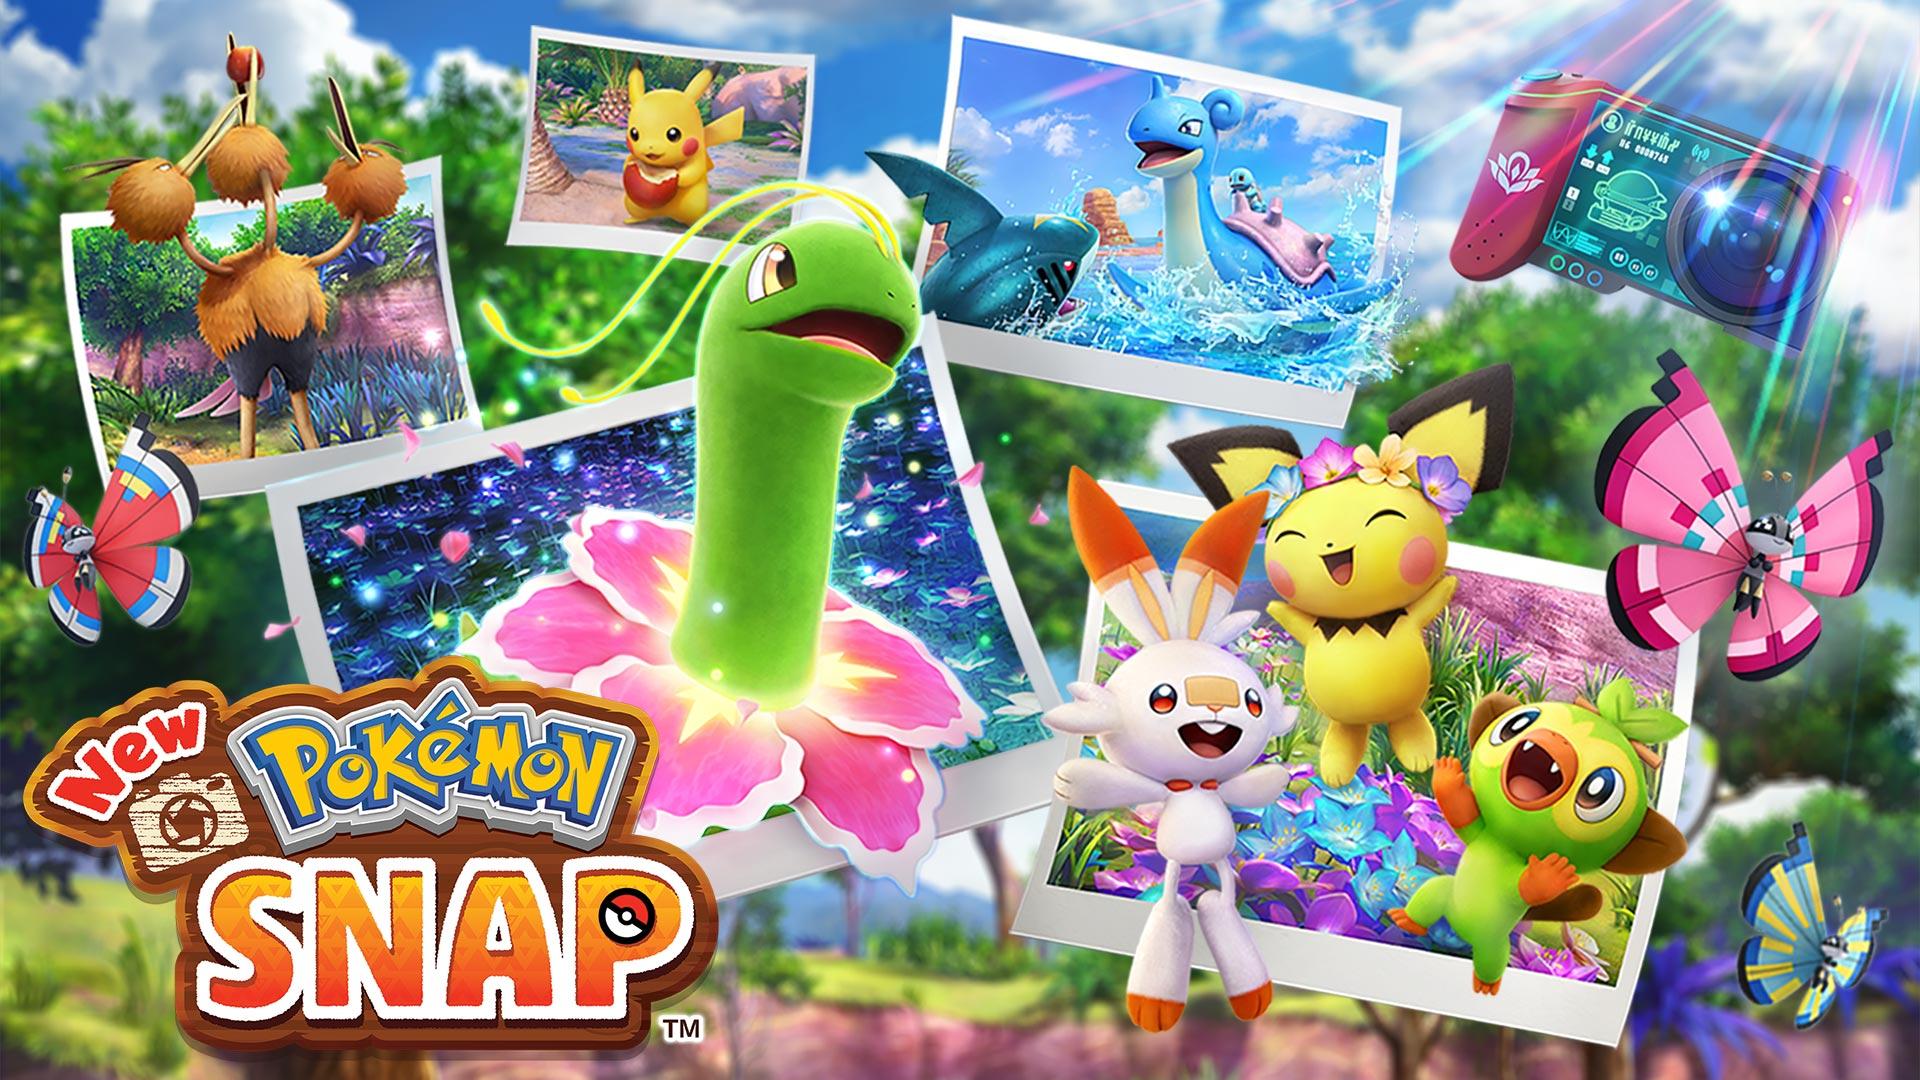 Pokemon Snap (Image Credits: Nintendo)